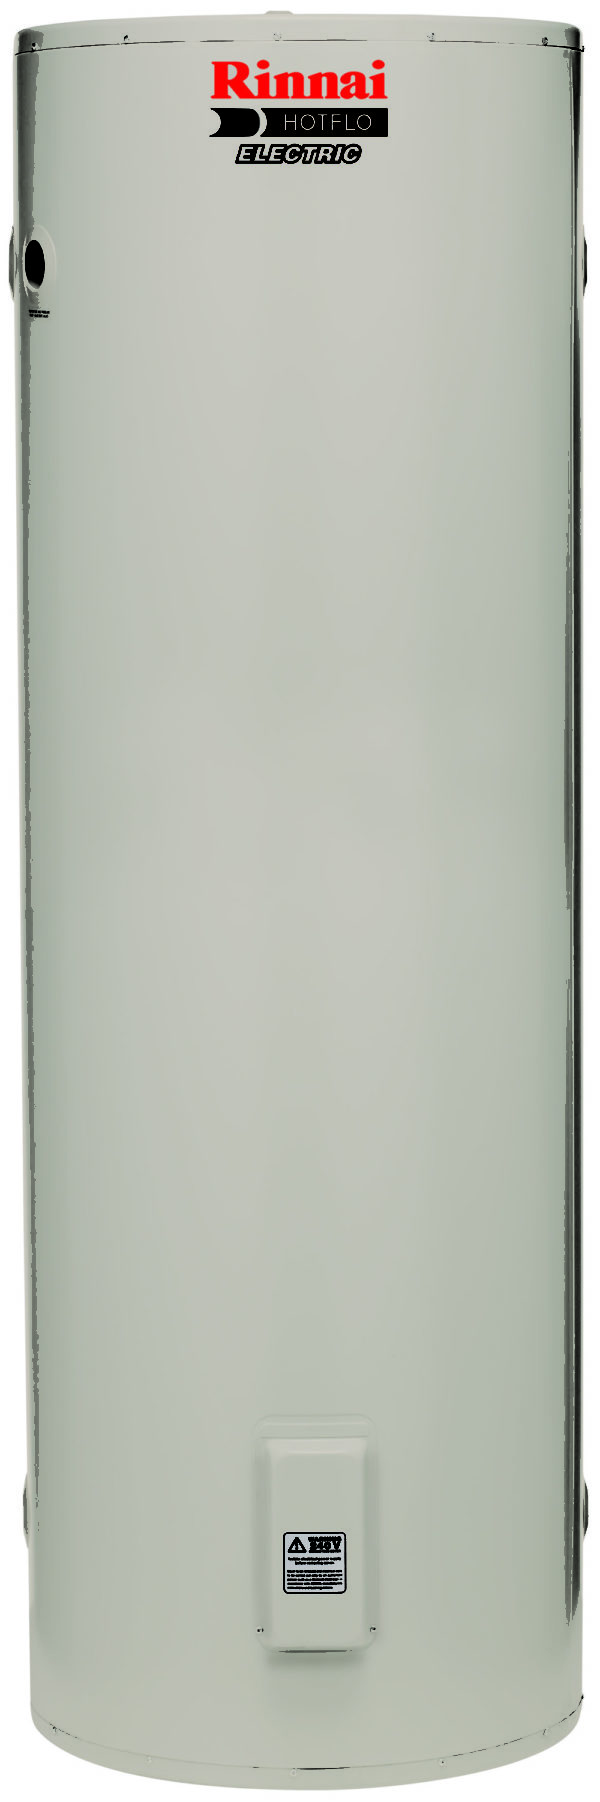 400L Rinnai Electric Hotflo Twin element